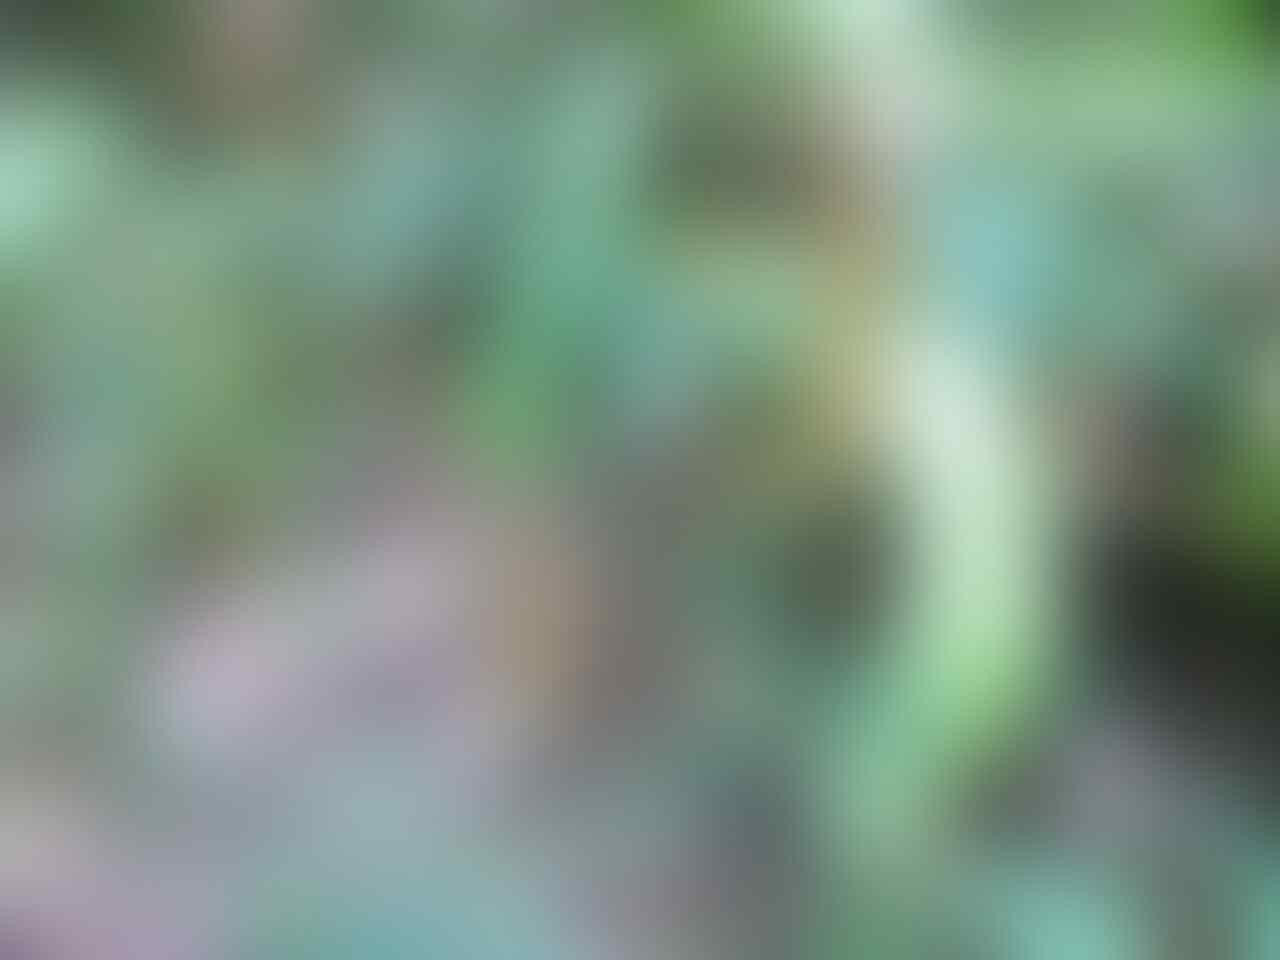 Mengenal si Kantung Semar (Nepenthes) serta tips dan trik memeliharanya #Aslinyalo